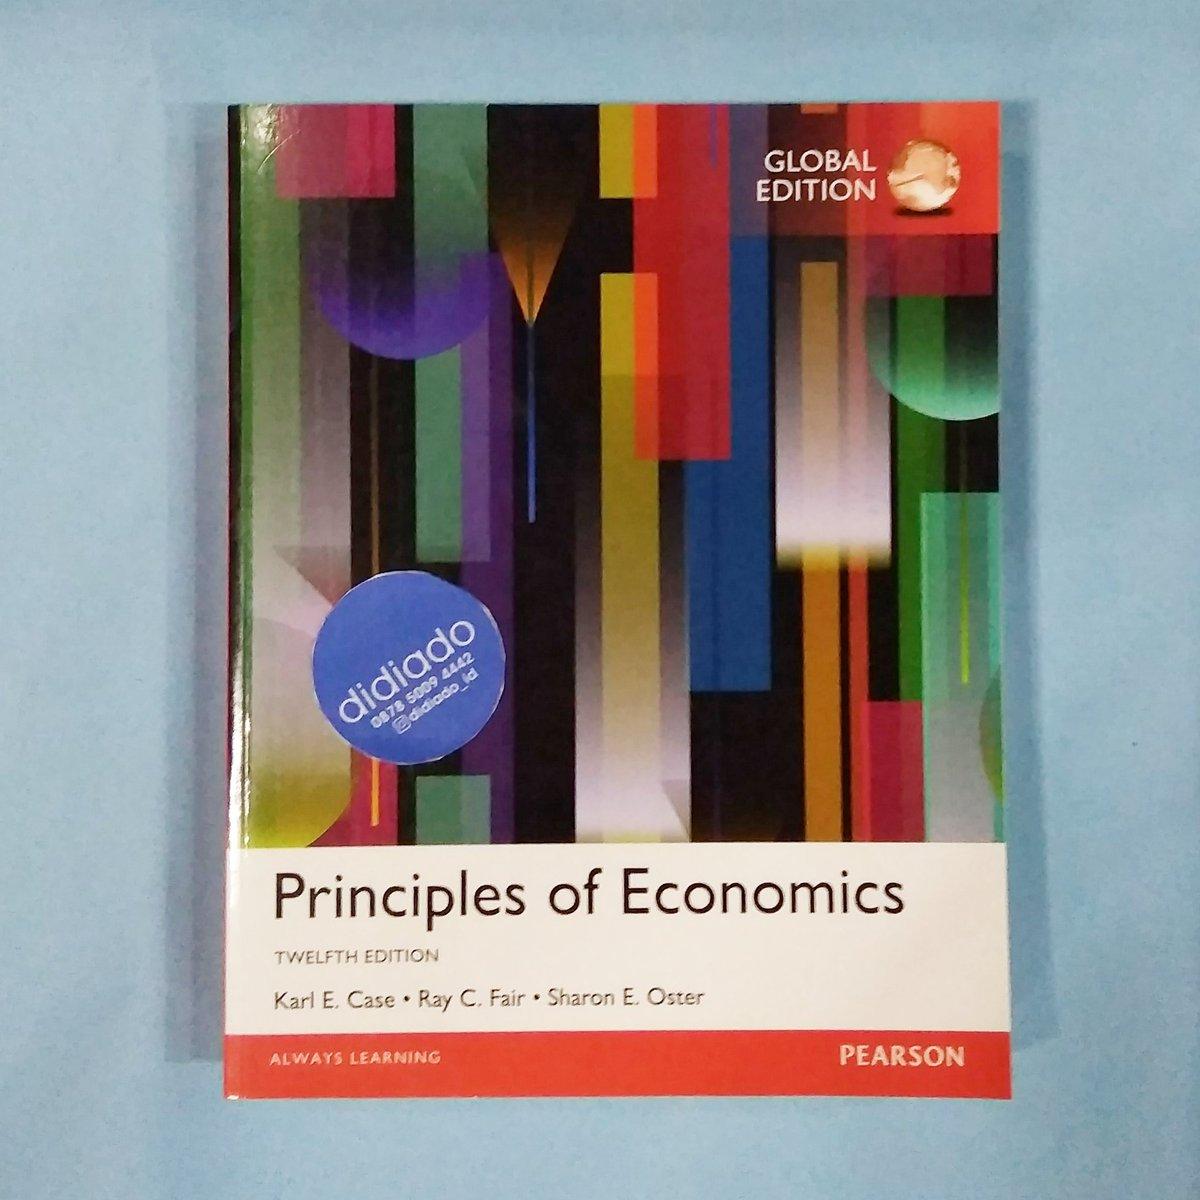 Principles of economics case fair array didiadobookstore hashtag on twitter rh twitter com jualbukuimport jualtextbookimport principles of economics fandeluxe Gallery